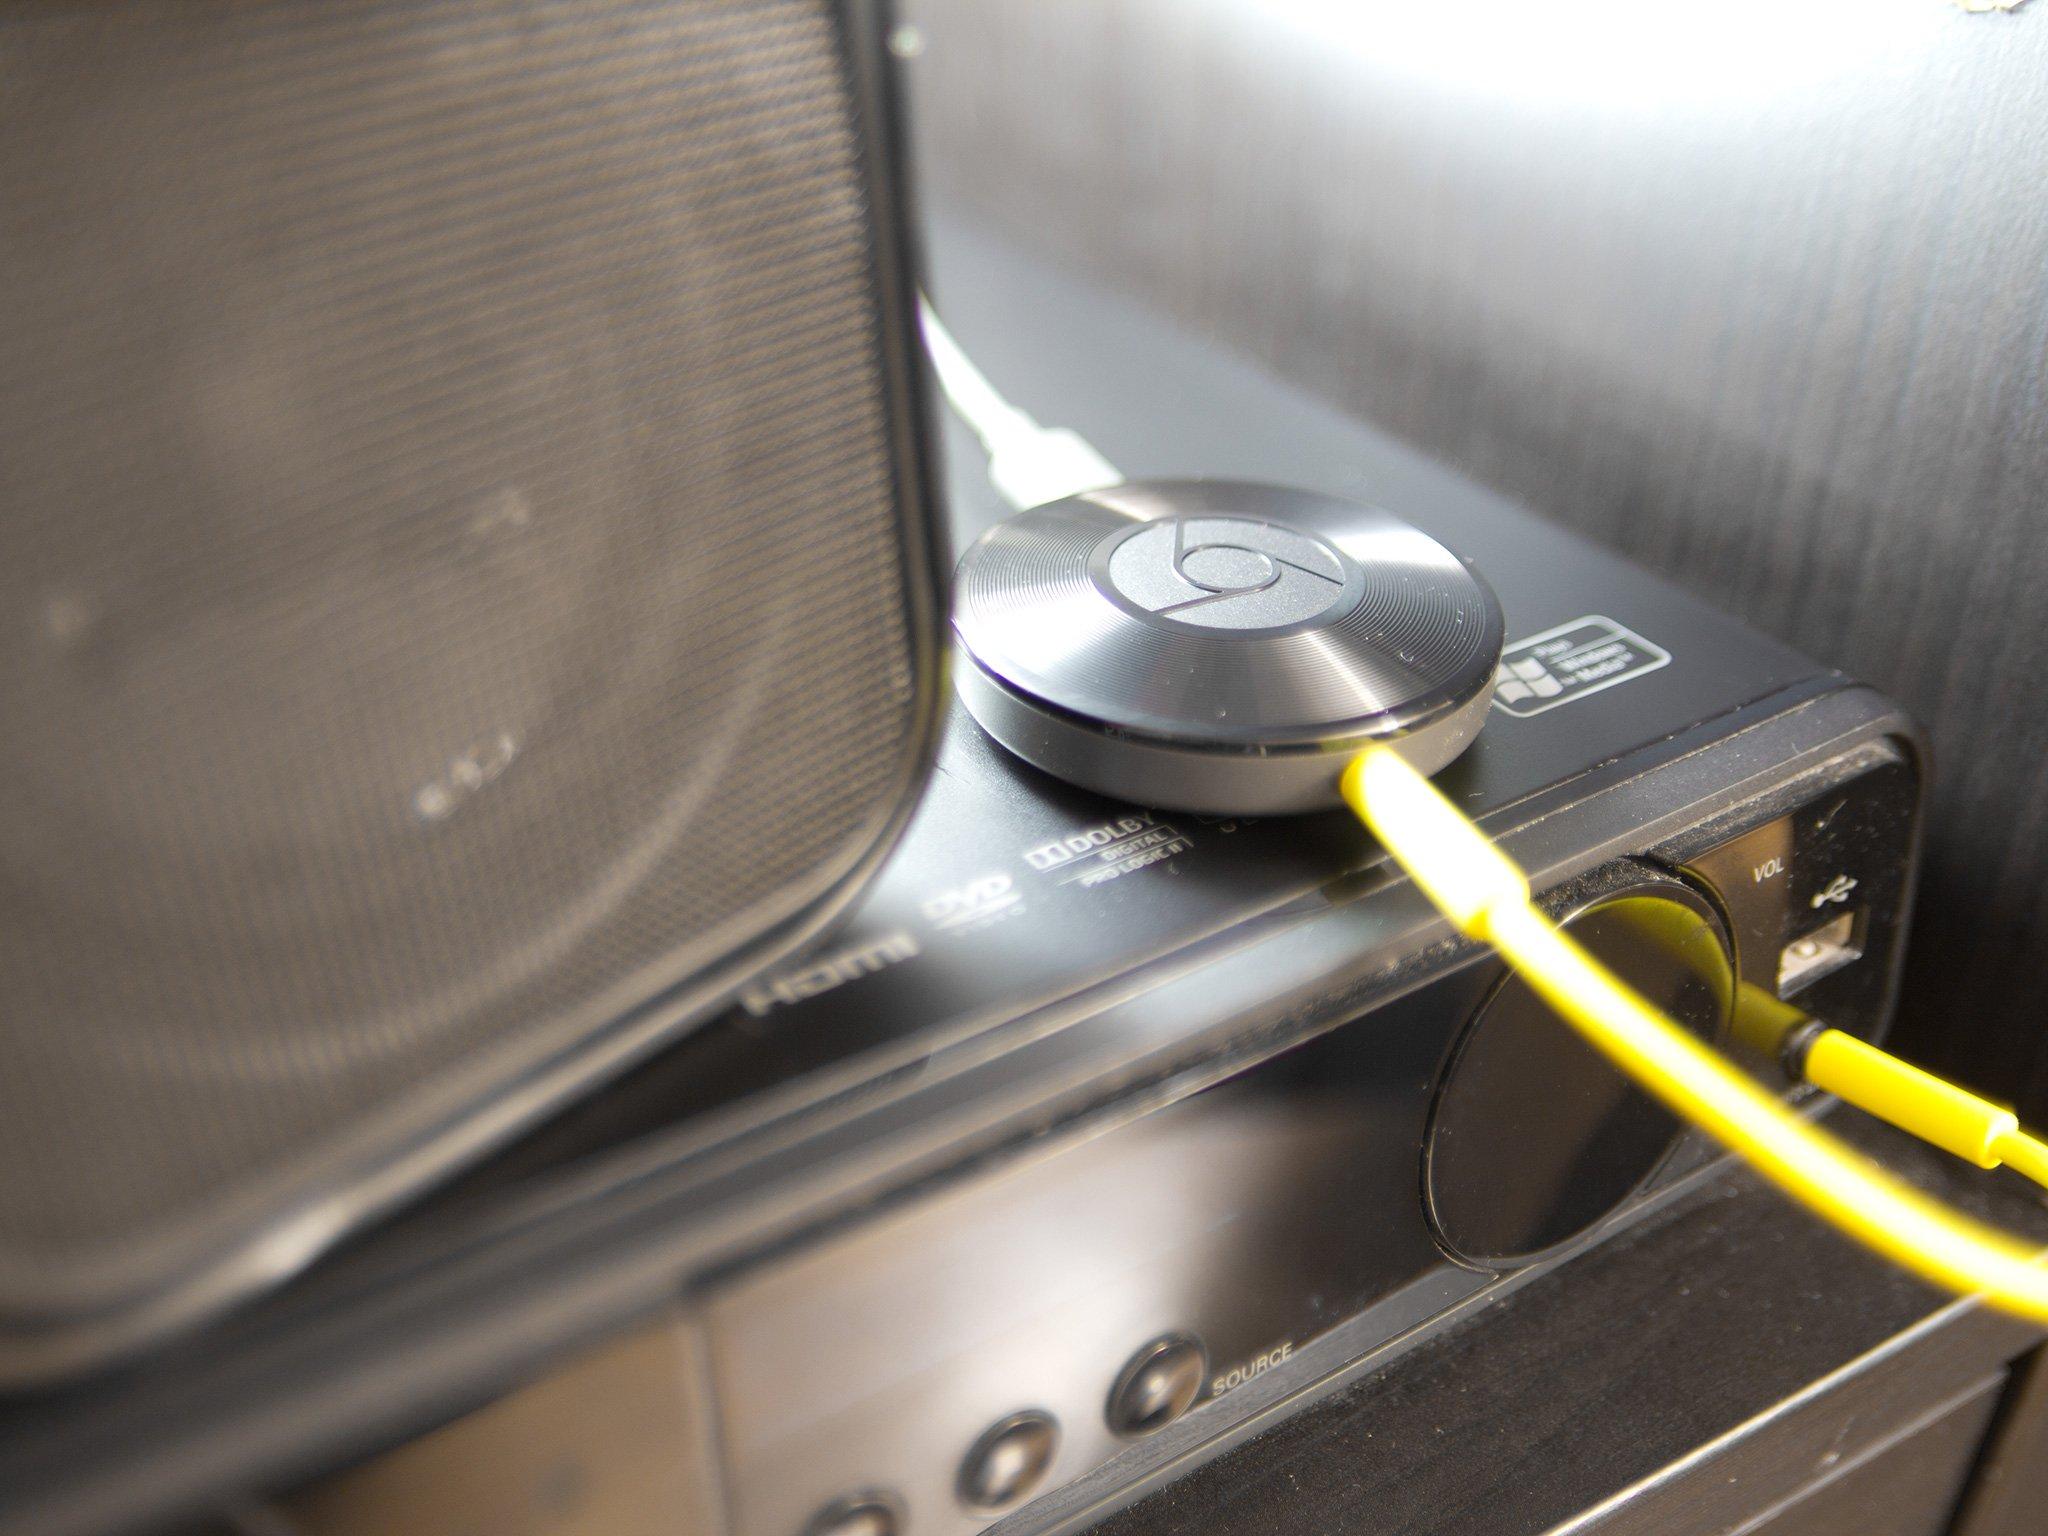 hight resolution of chromecast audio system